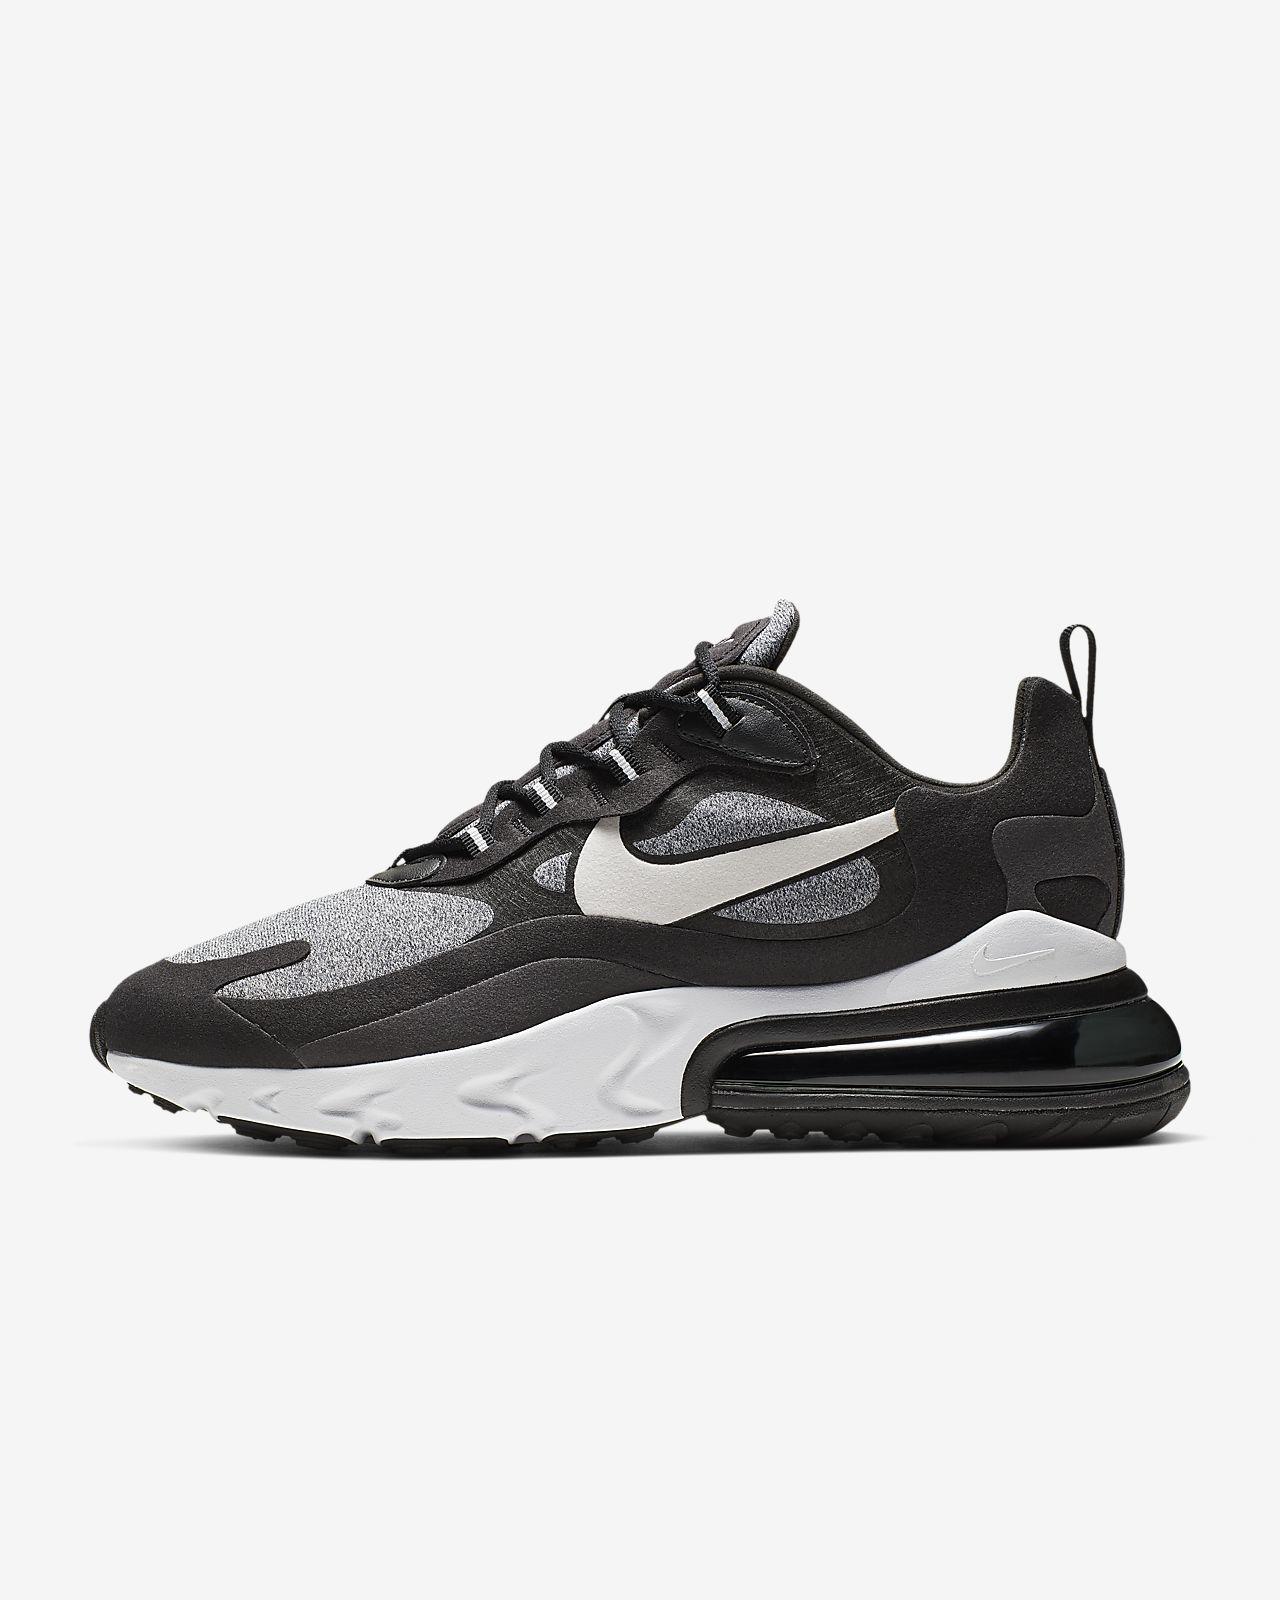 Nike Air Max 270 React (Op Art) Herrenschuh